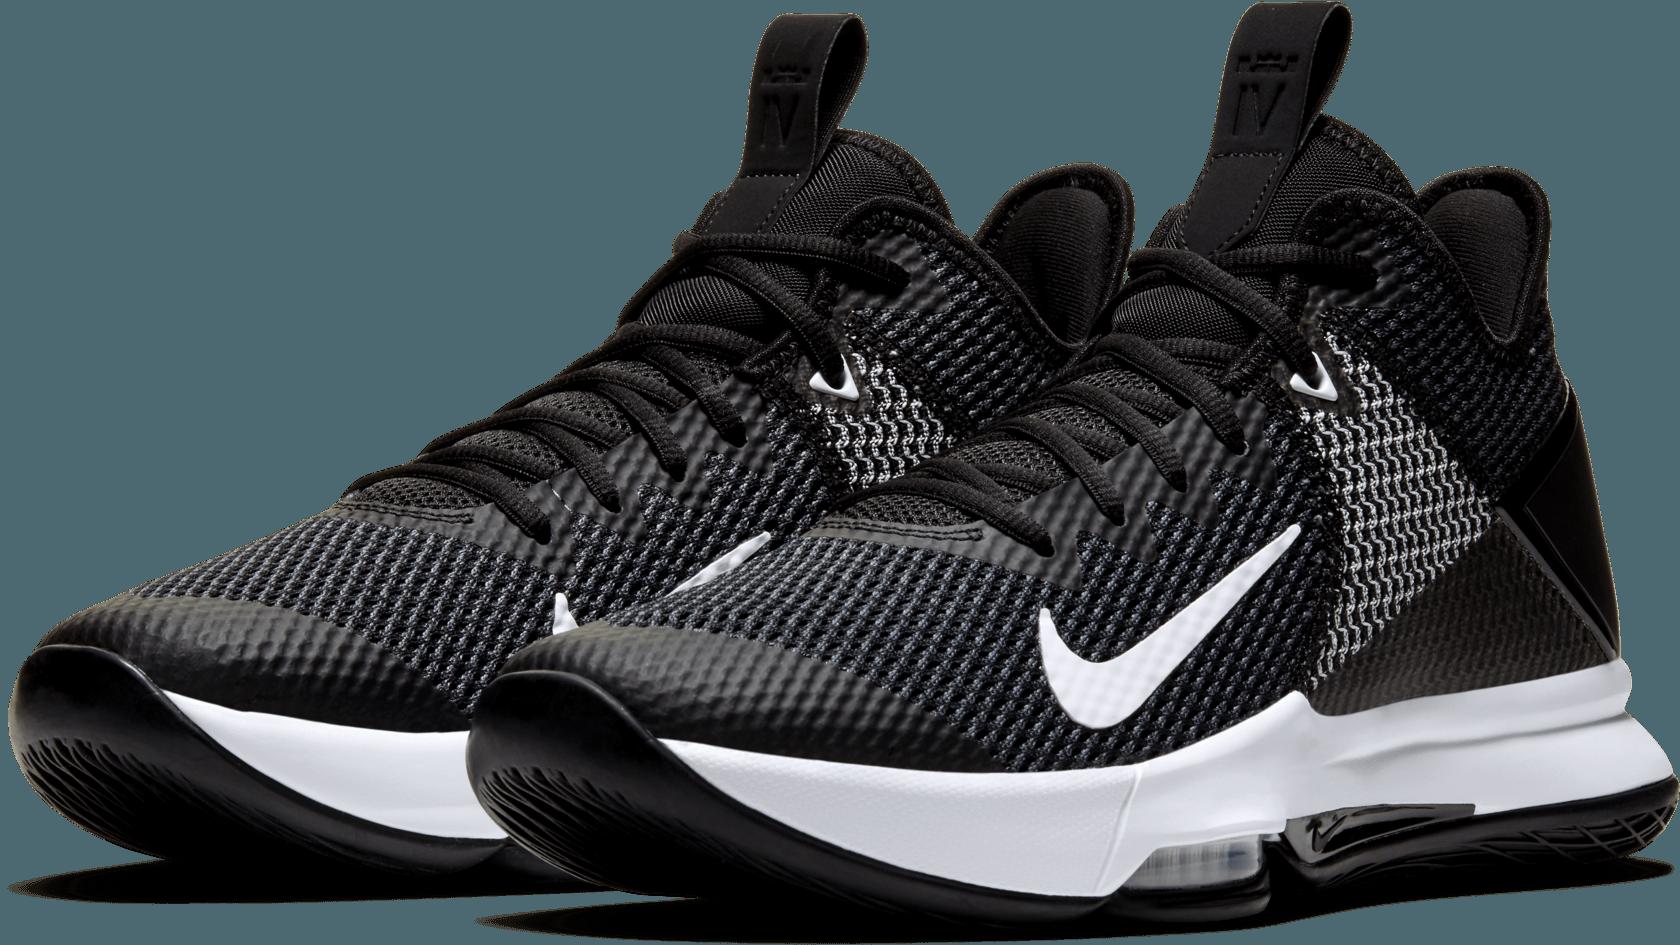 Nike Lebron Witness 4 Basketball